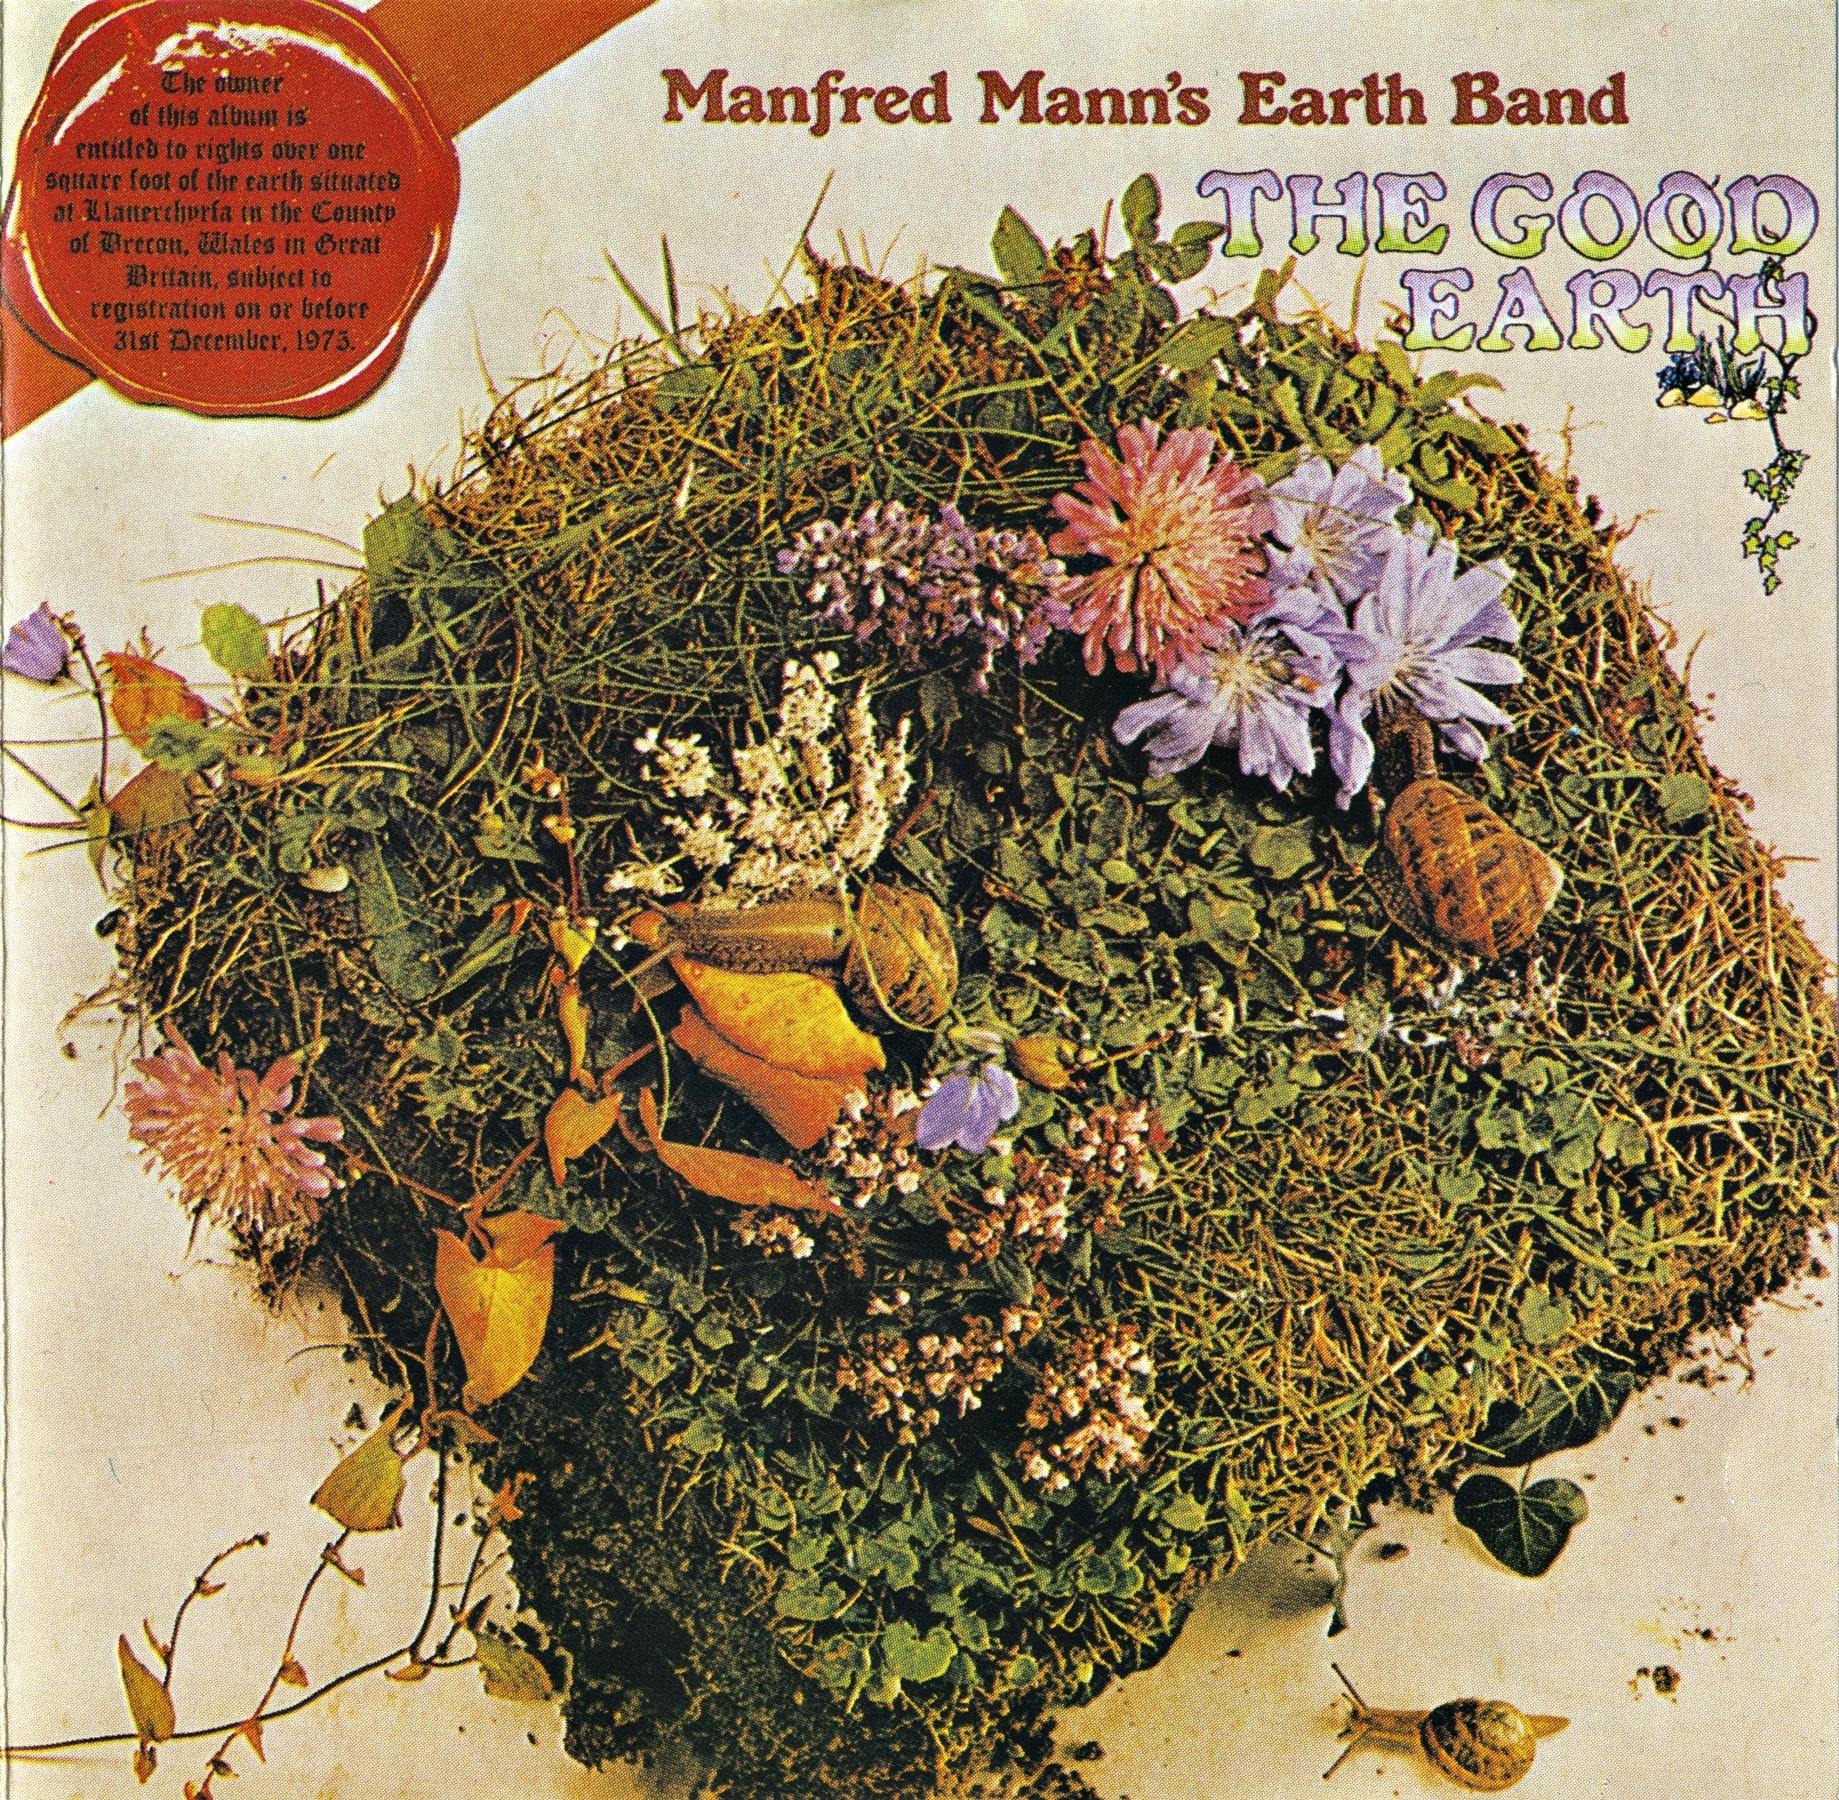 Manfred Mann's Earth Band - Earth Hymn